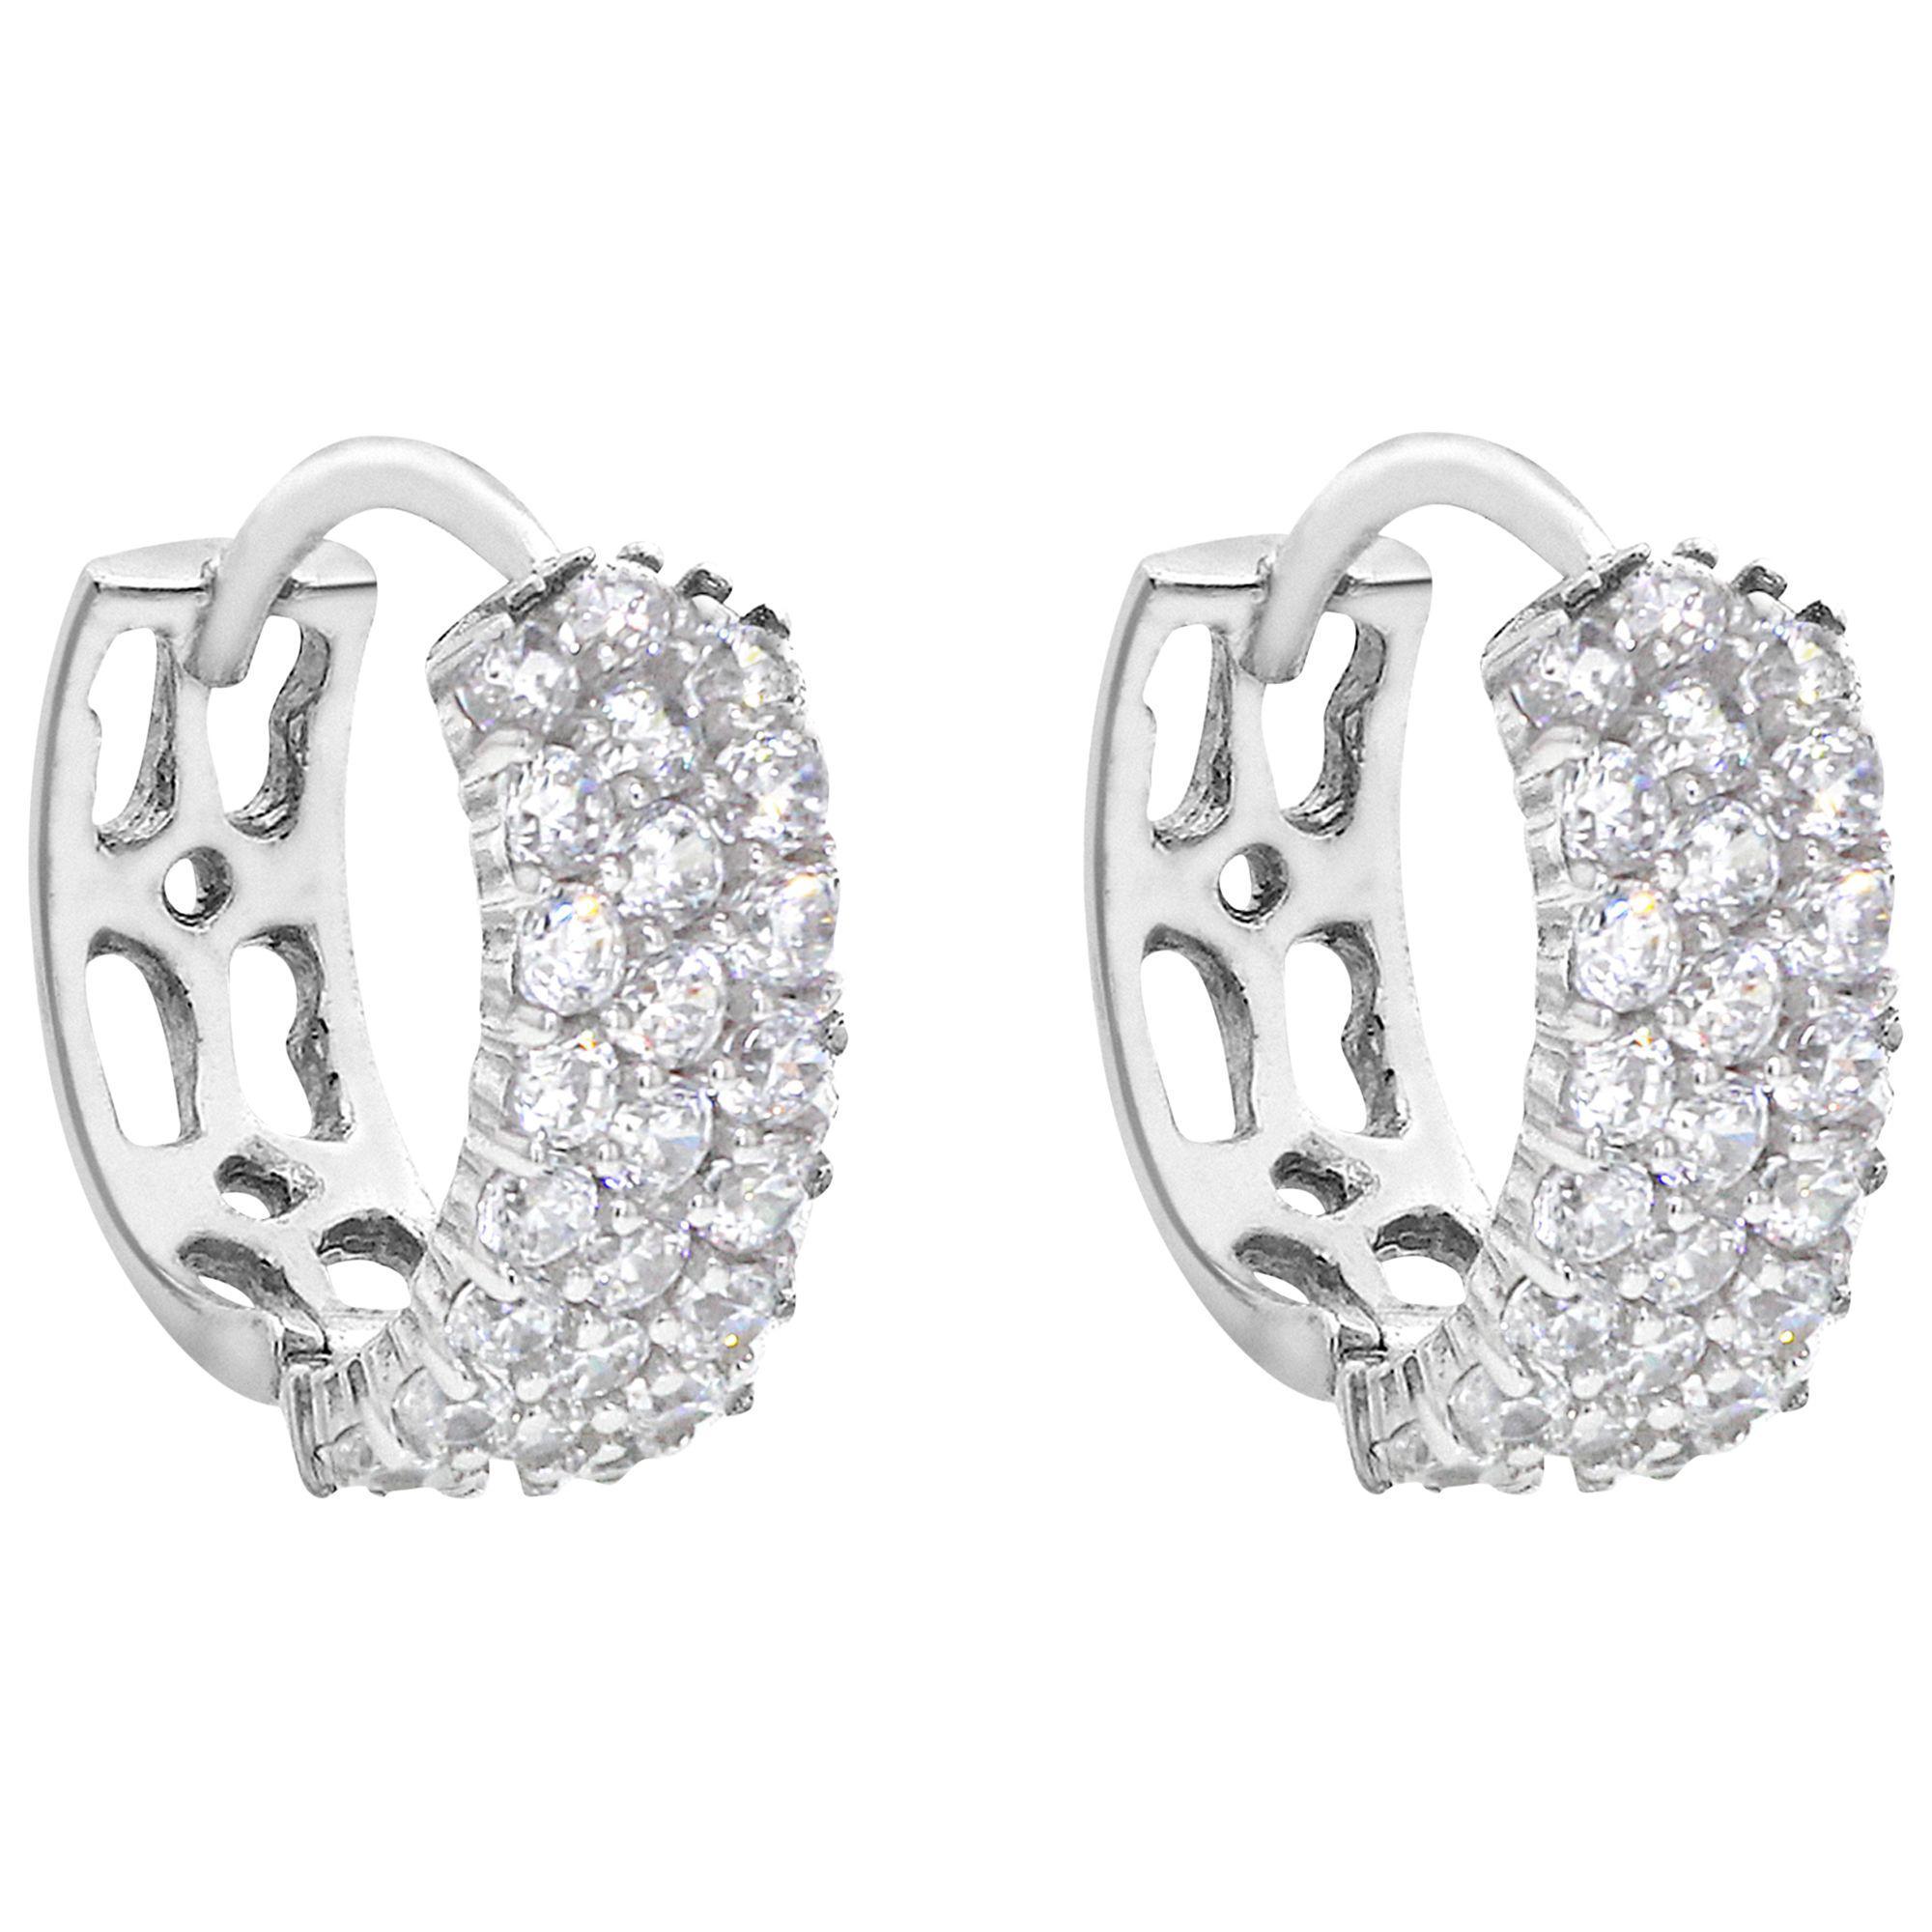 Ib B Women S Metallic 9ct White Gold 3 Row Cubic Zirconia Hoop Earrings